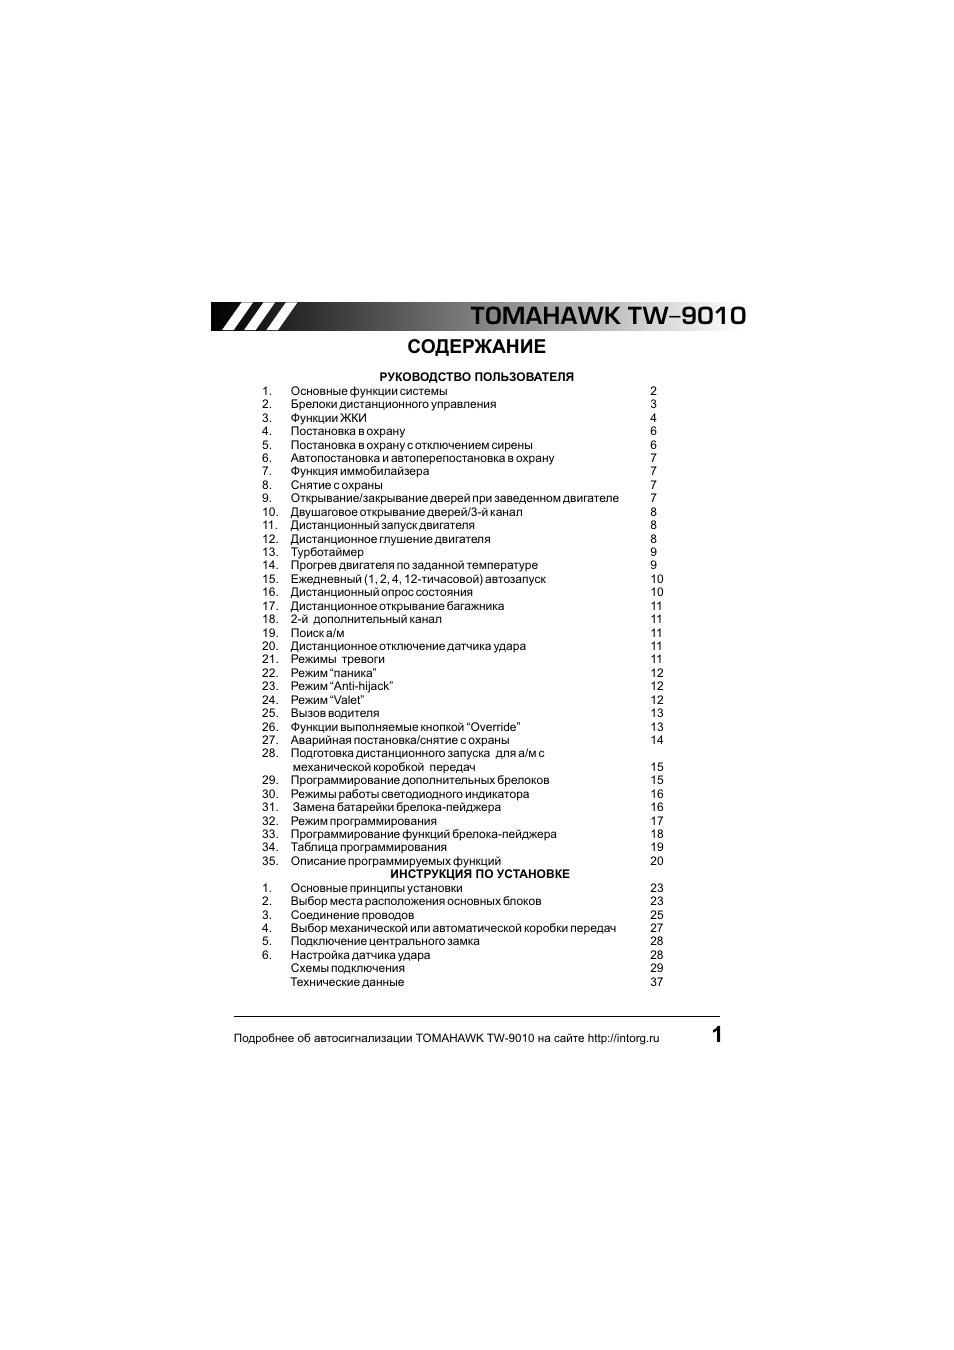 руководство по эксплуатации автосигнализации томагавк 9010